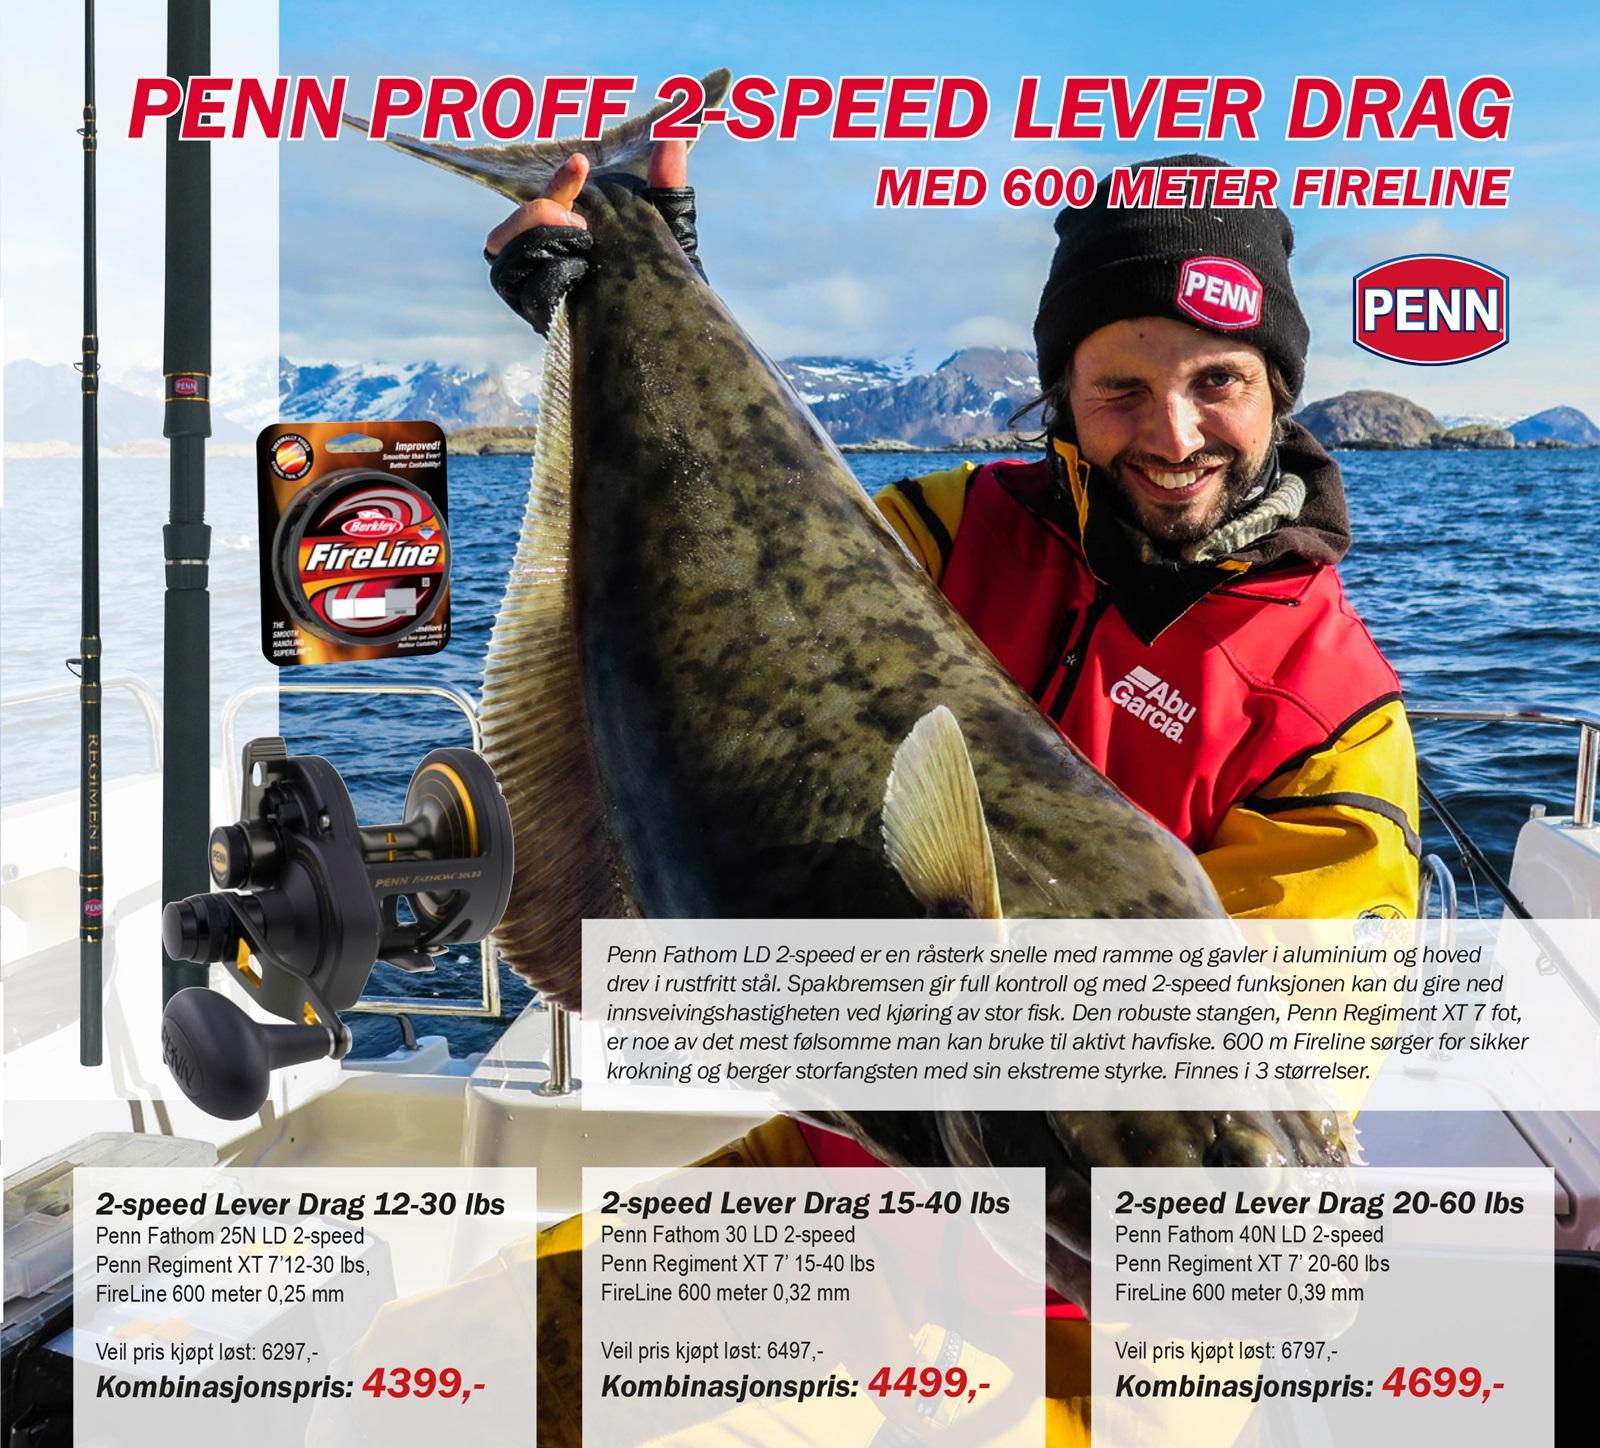 Penn proff 2-speed